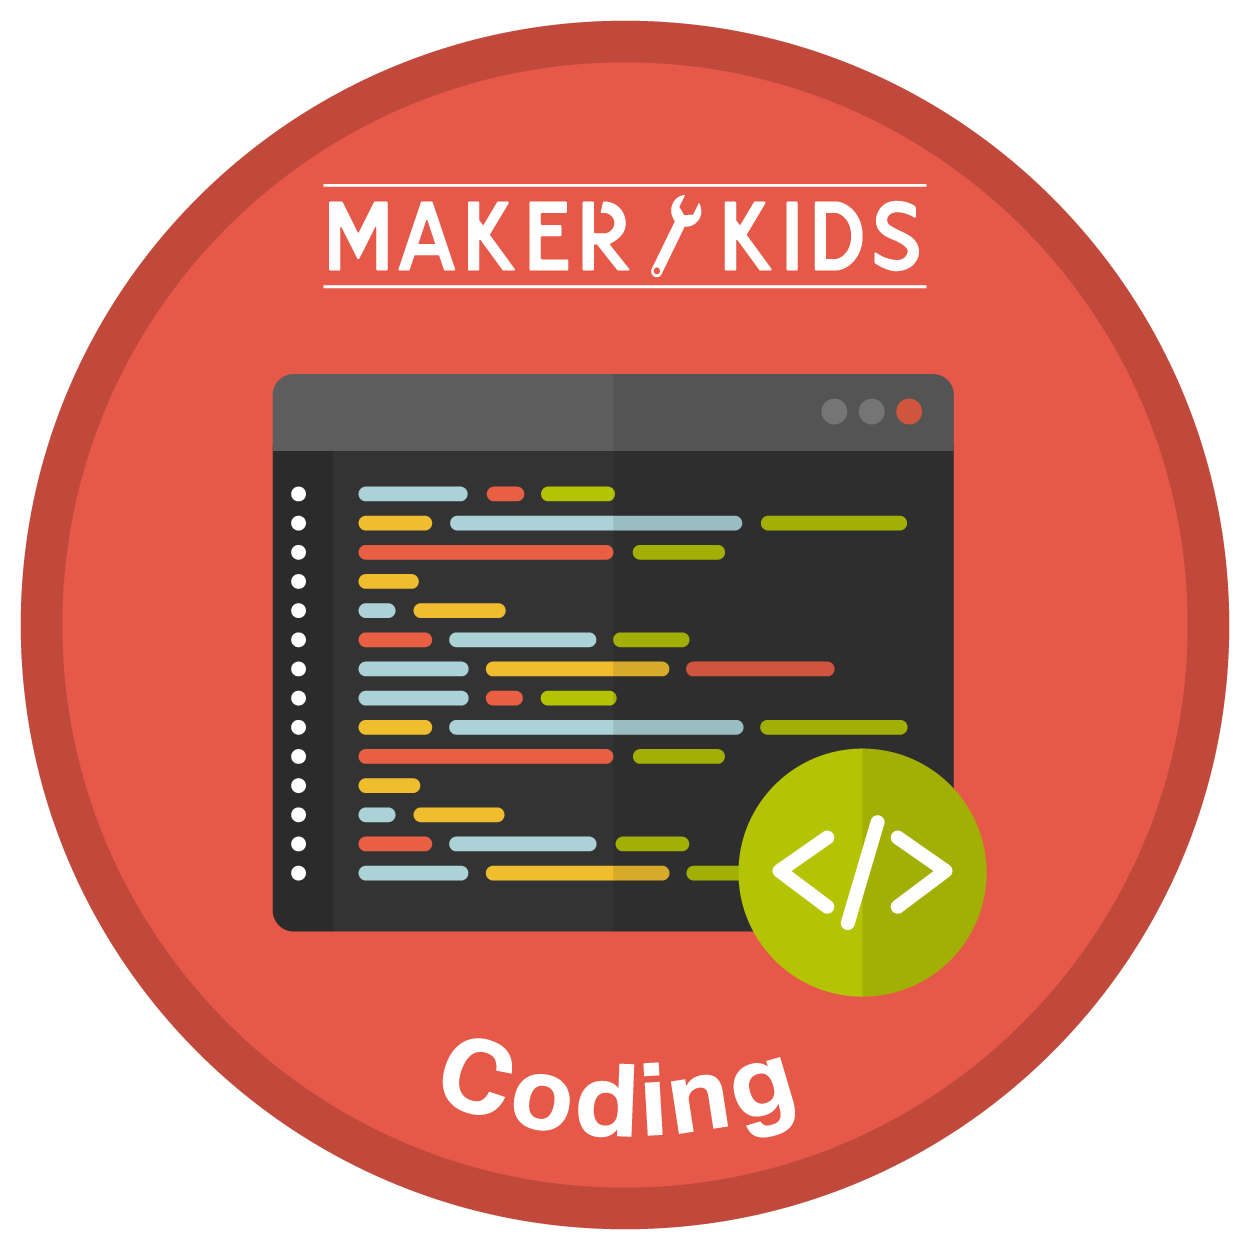 MakerKids Coding Toronto